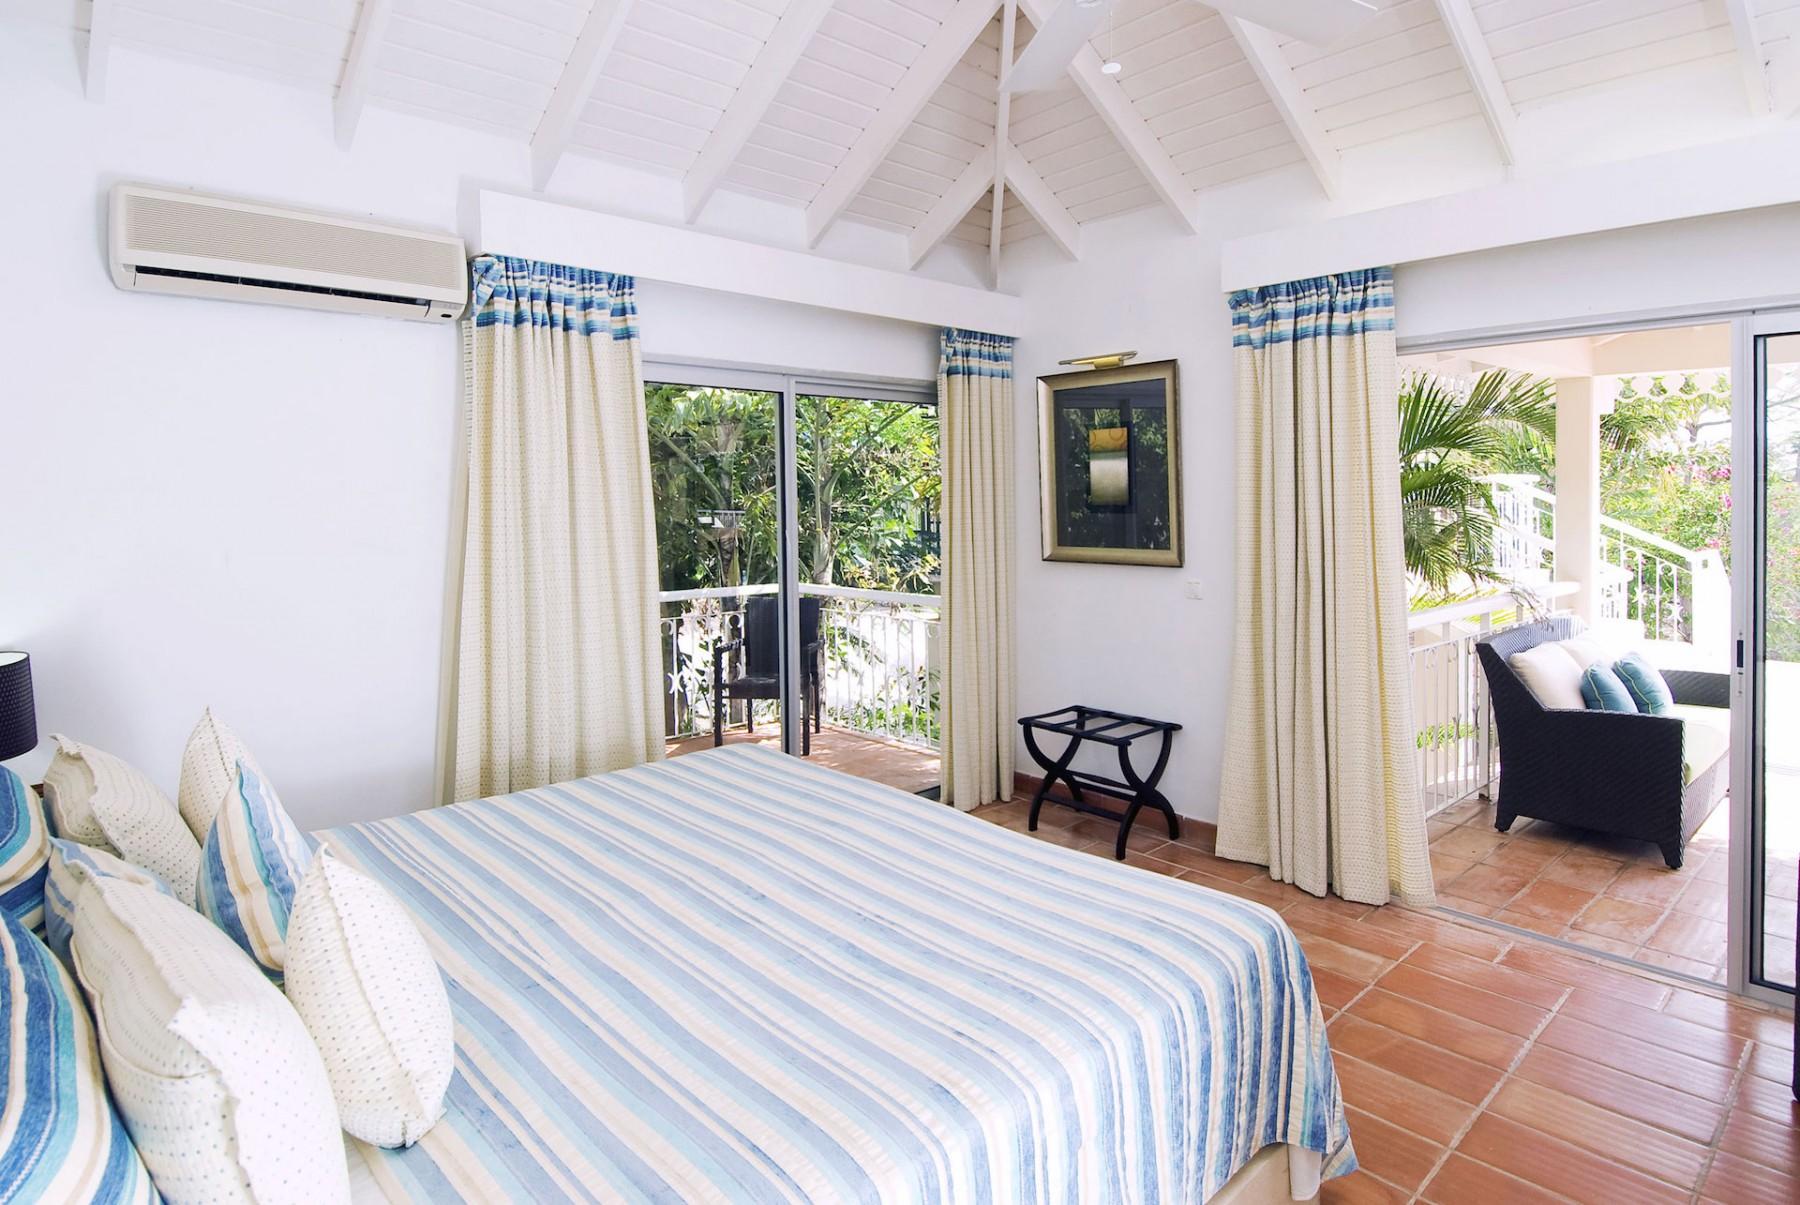 Villa Jardin Creole St Martin - 4 CH Location Villa Luxe Terres Basses